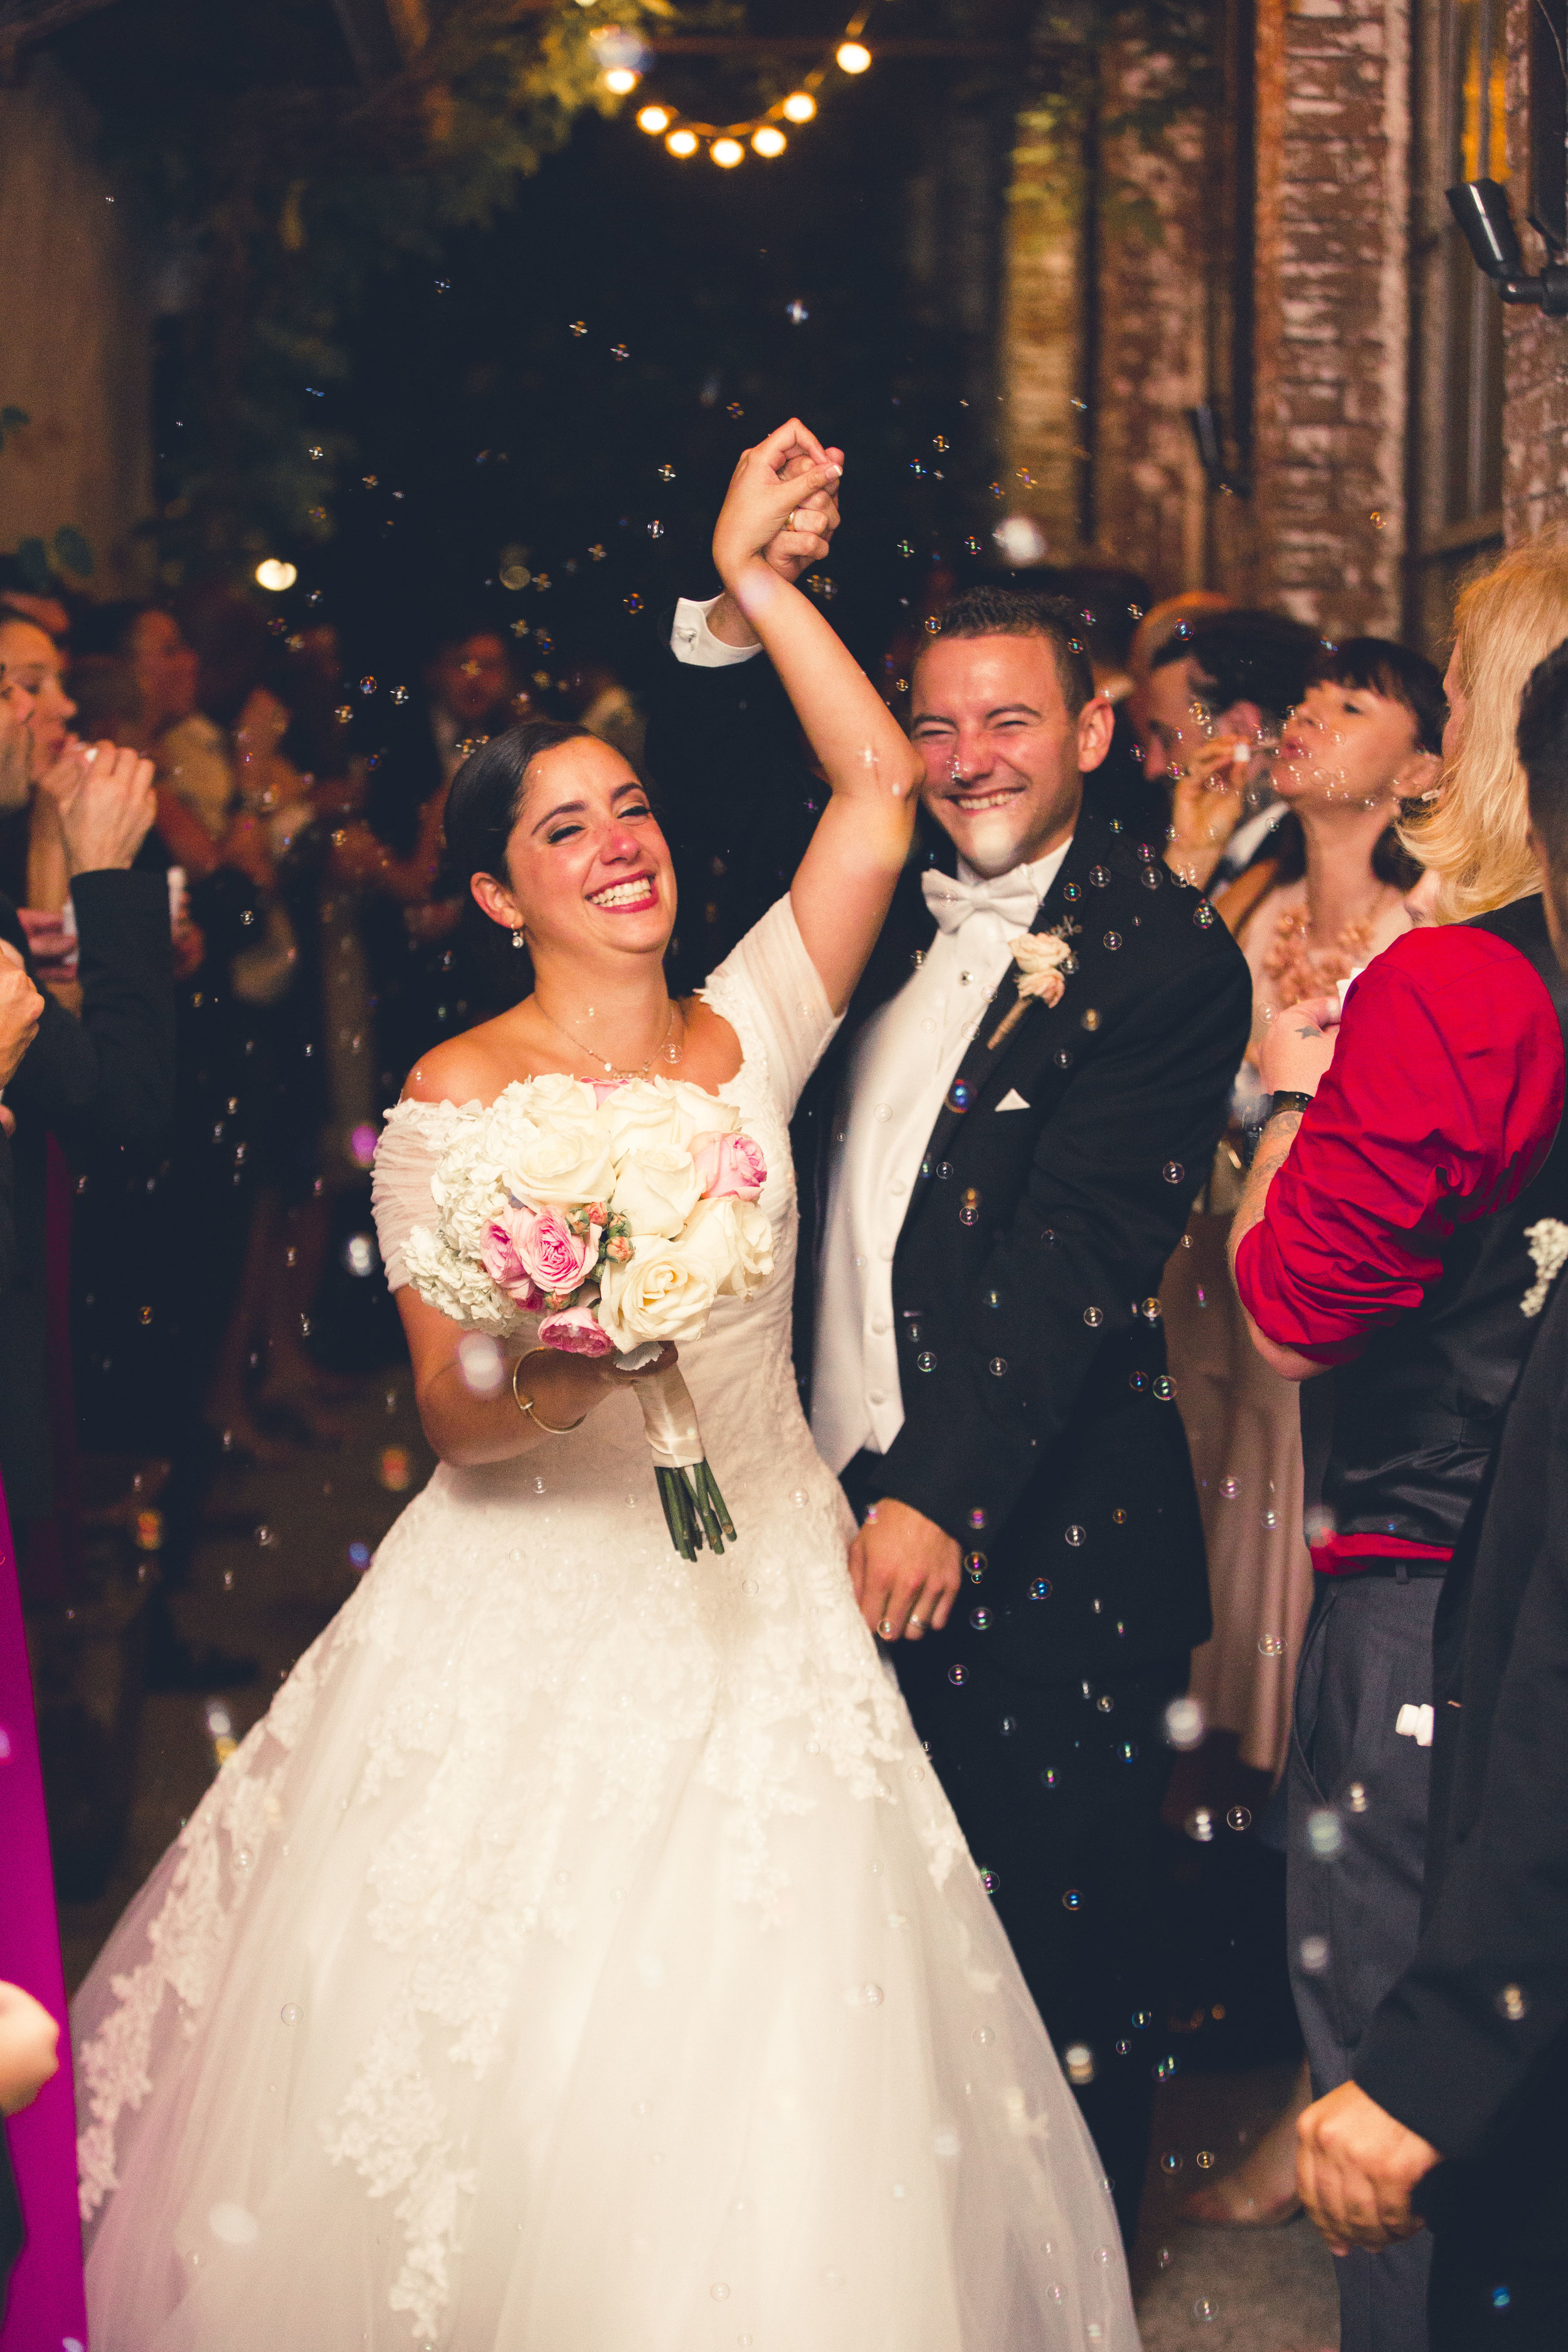 ATGI_Magali & Josh Wedding1_2S8A3054.jpg